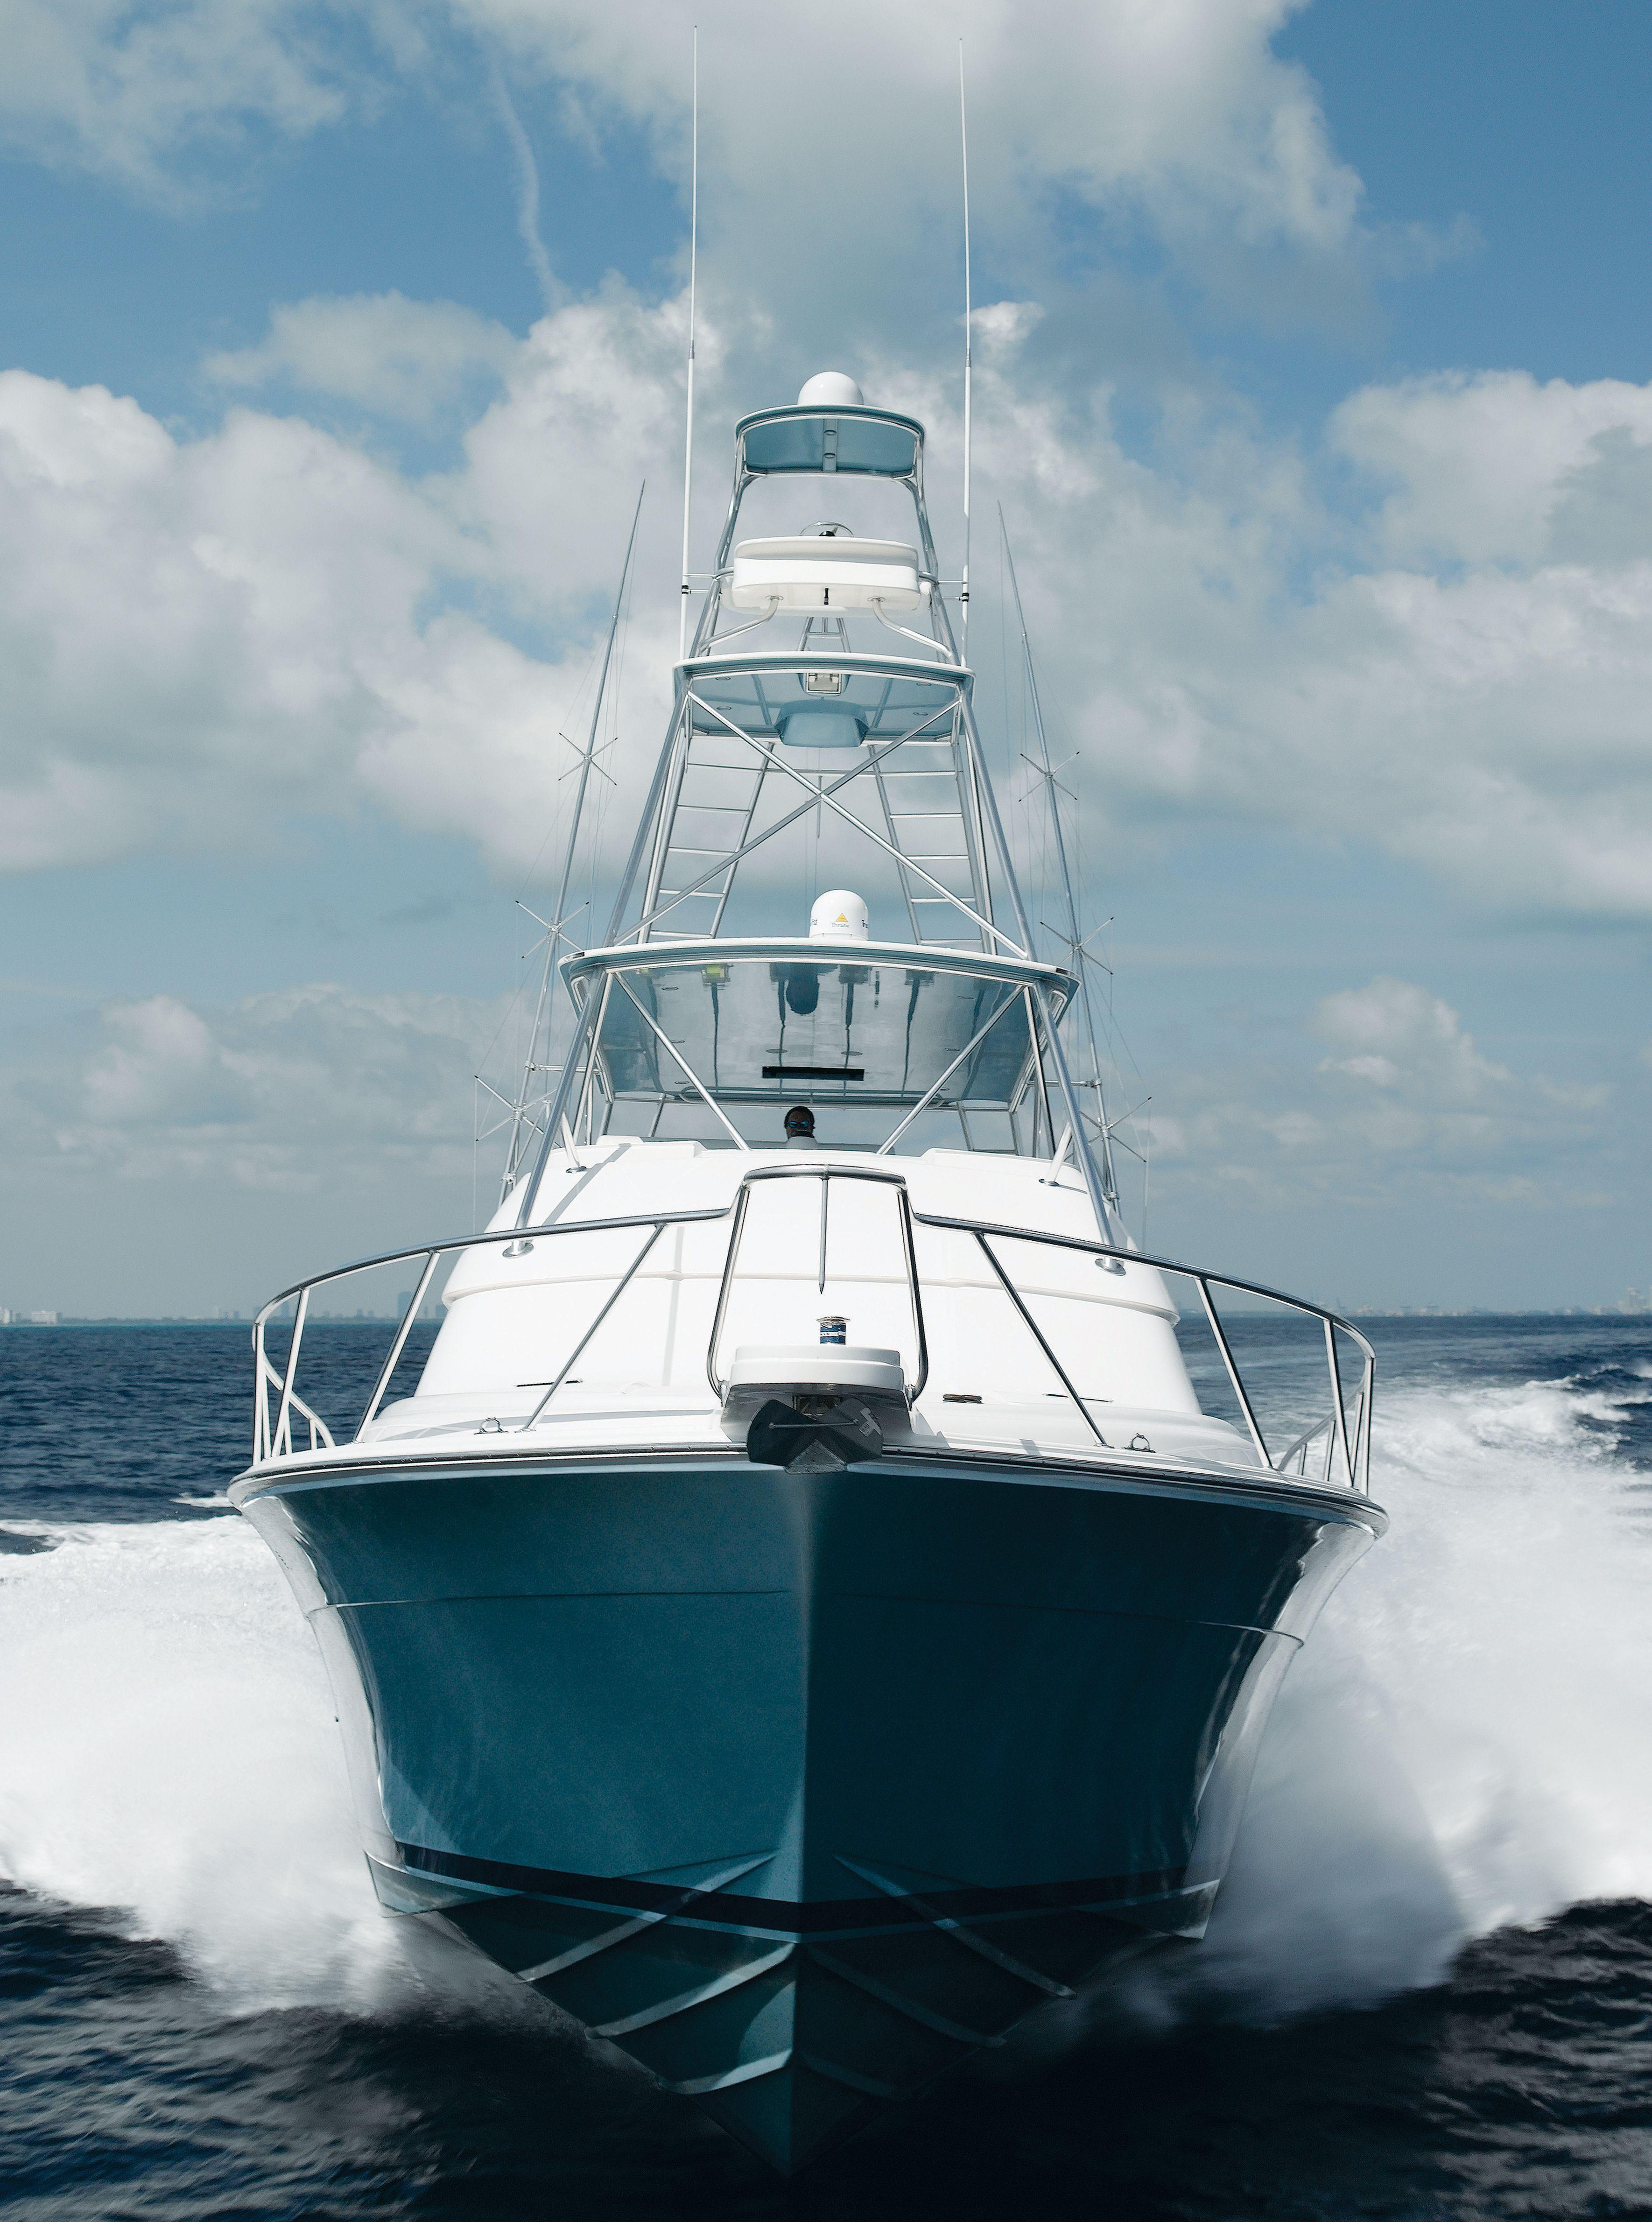 Bertram 57 Luxury Sportfishing Yacht ByDiver969